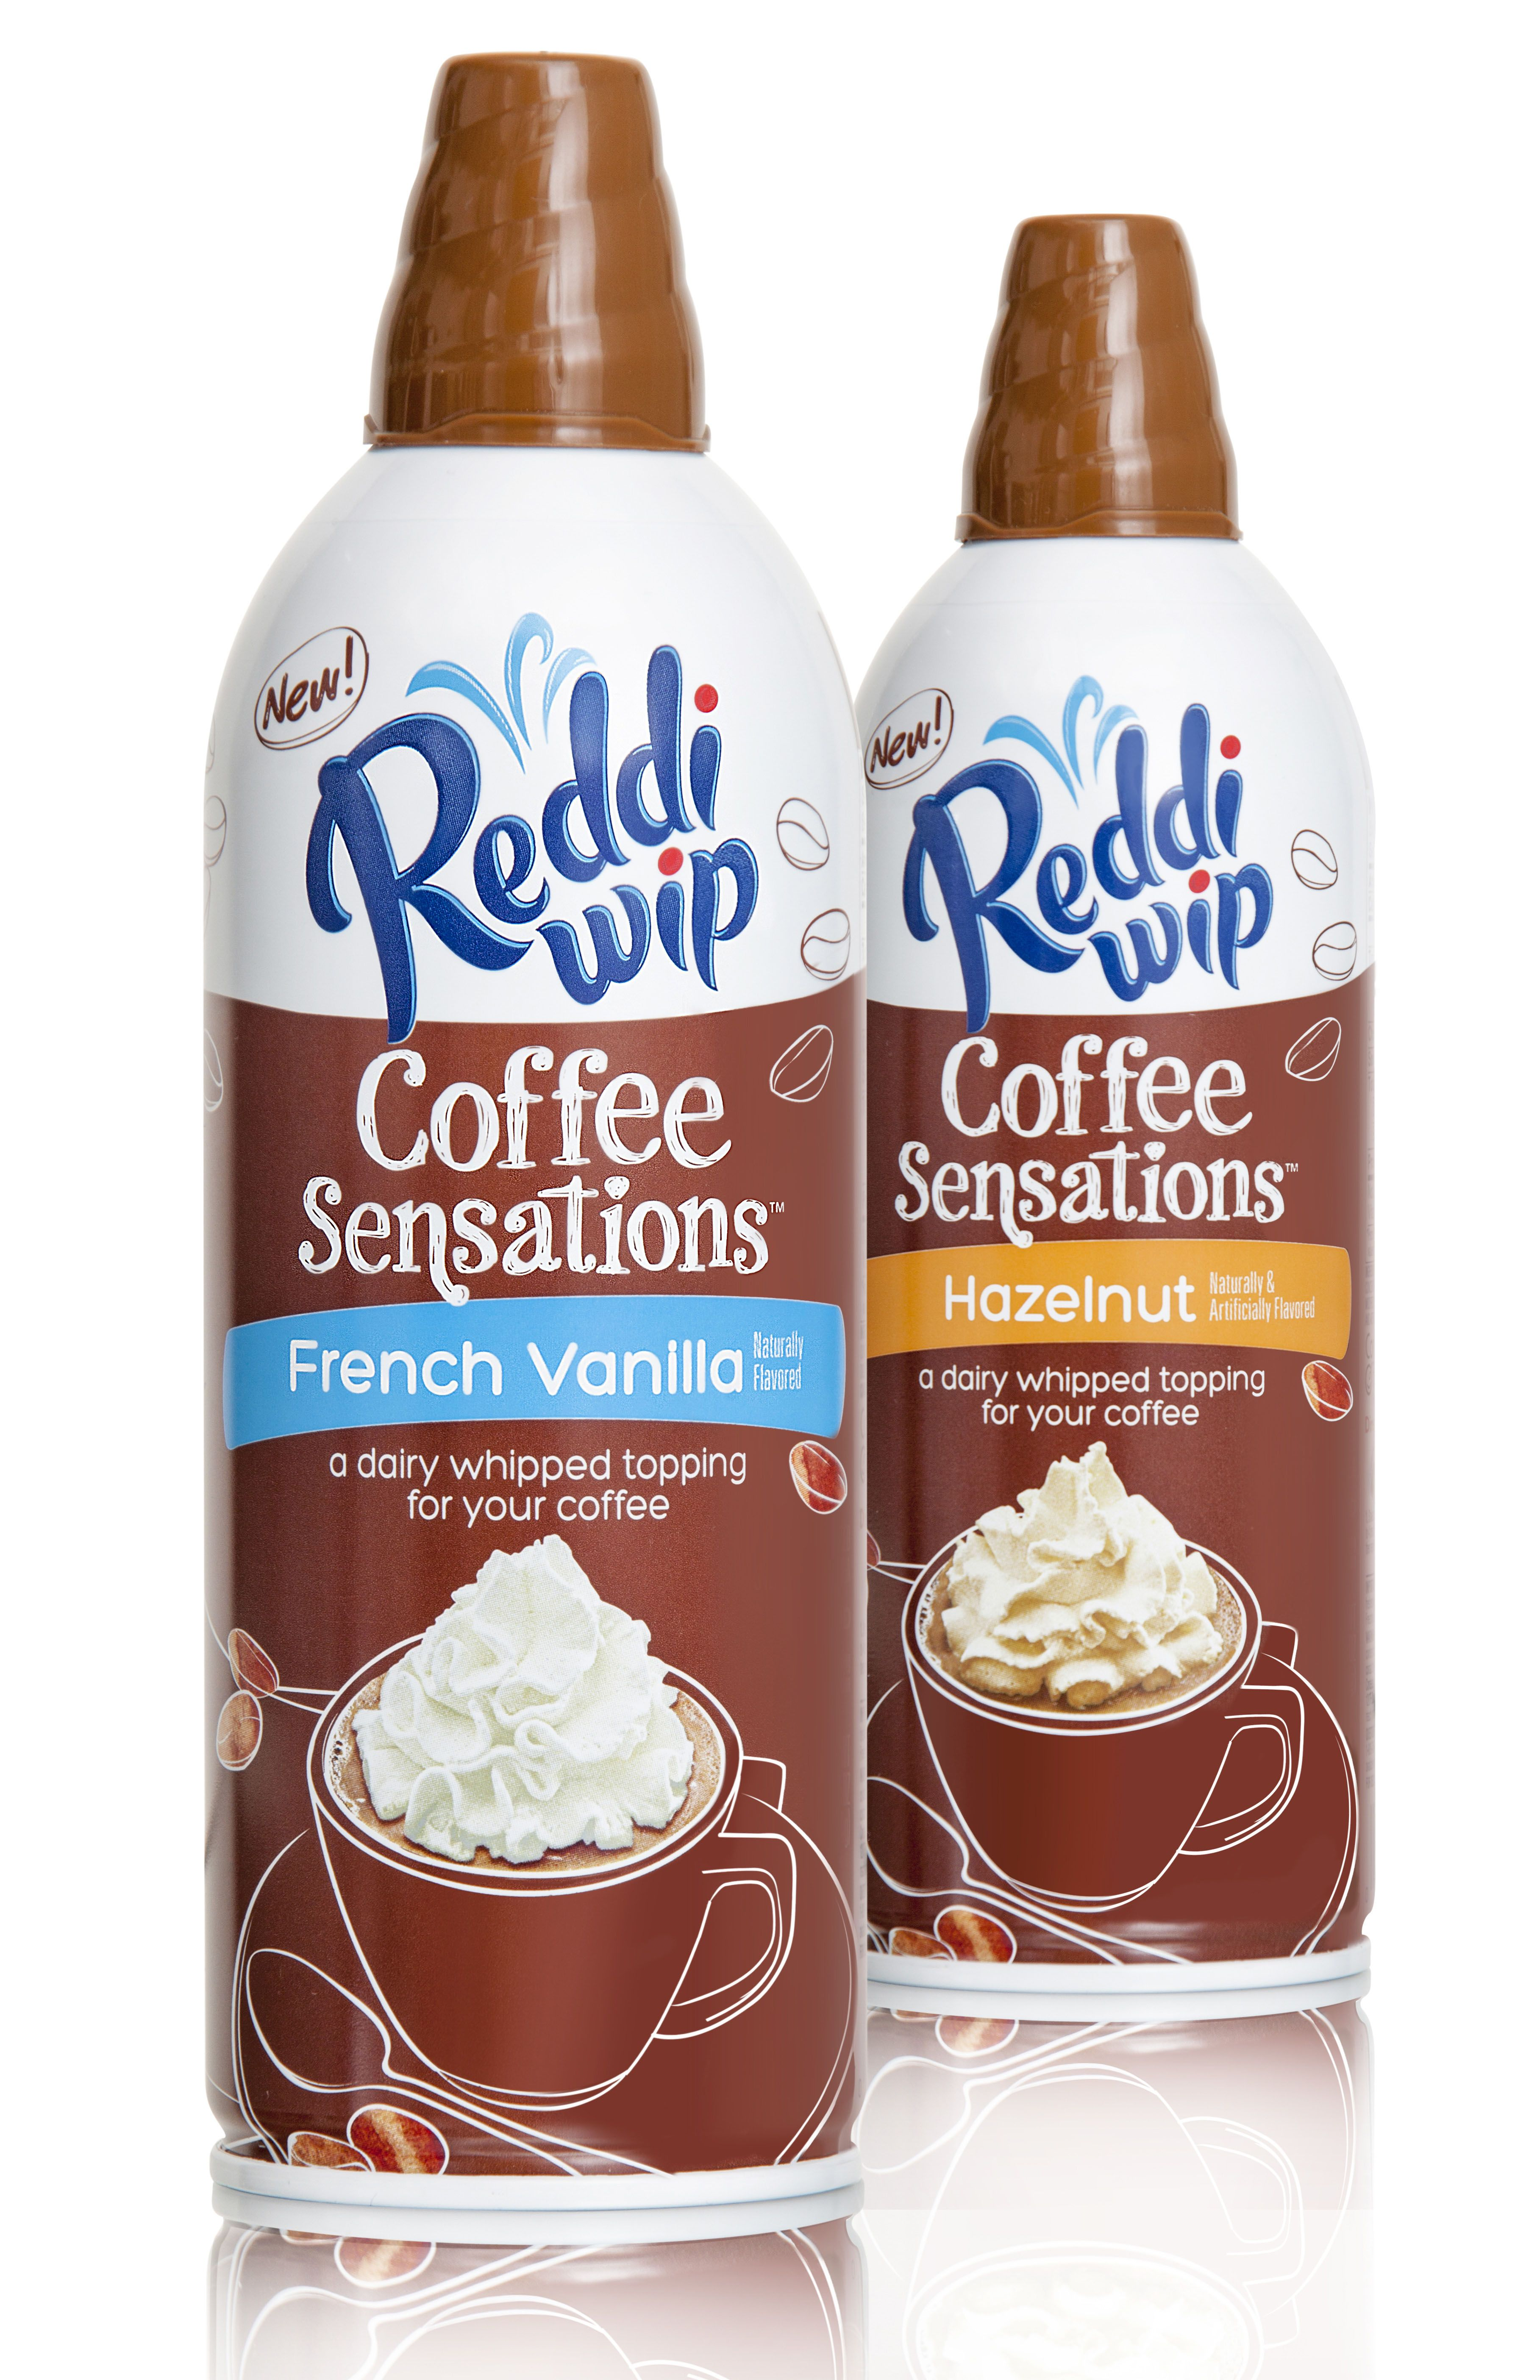 Reddi Wip Coffee Sensations French vanilla, Wine bottle